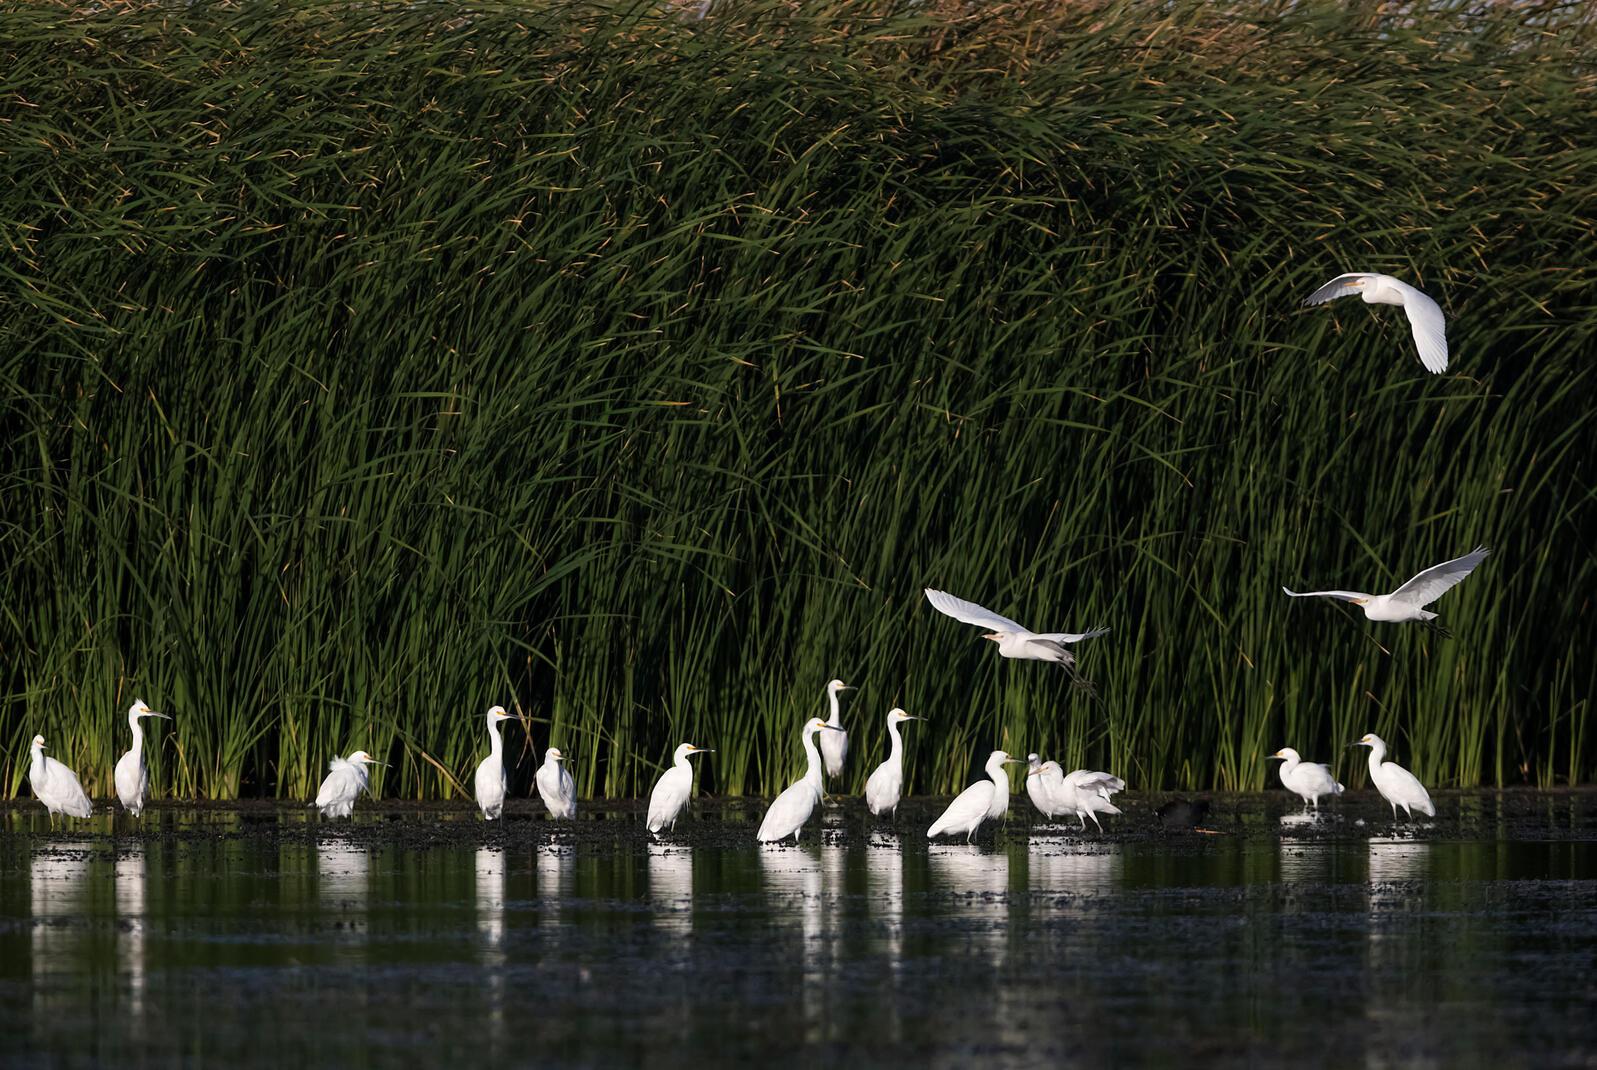 Cattle Egrets and Snowy Egrets in the Cienega de Santa Clara, the largest remaining wetland in the Colorado River Delta. Claudio Contreras Koob